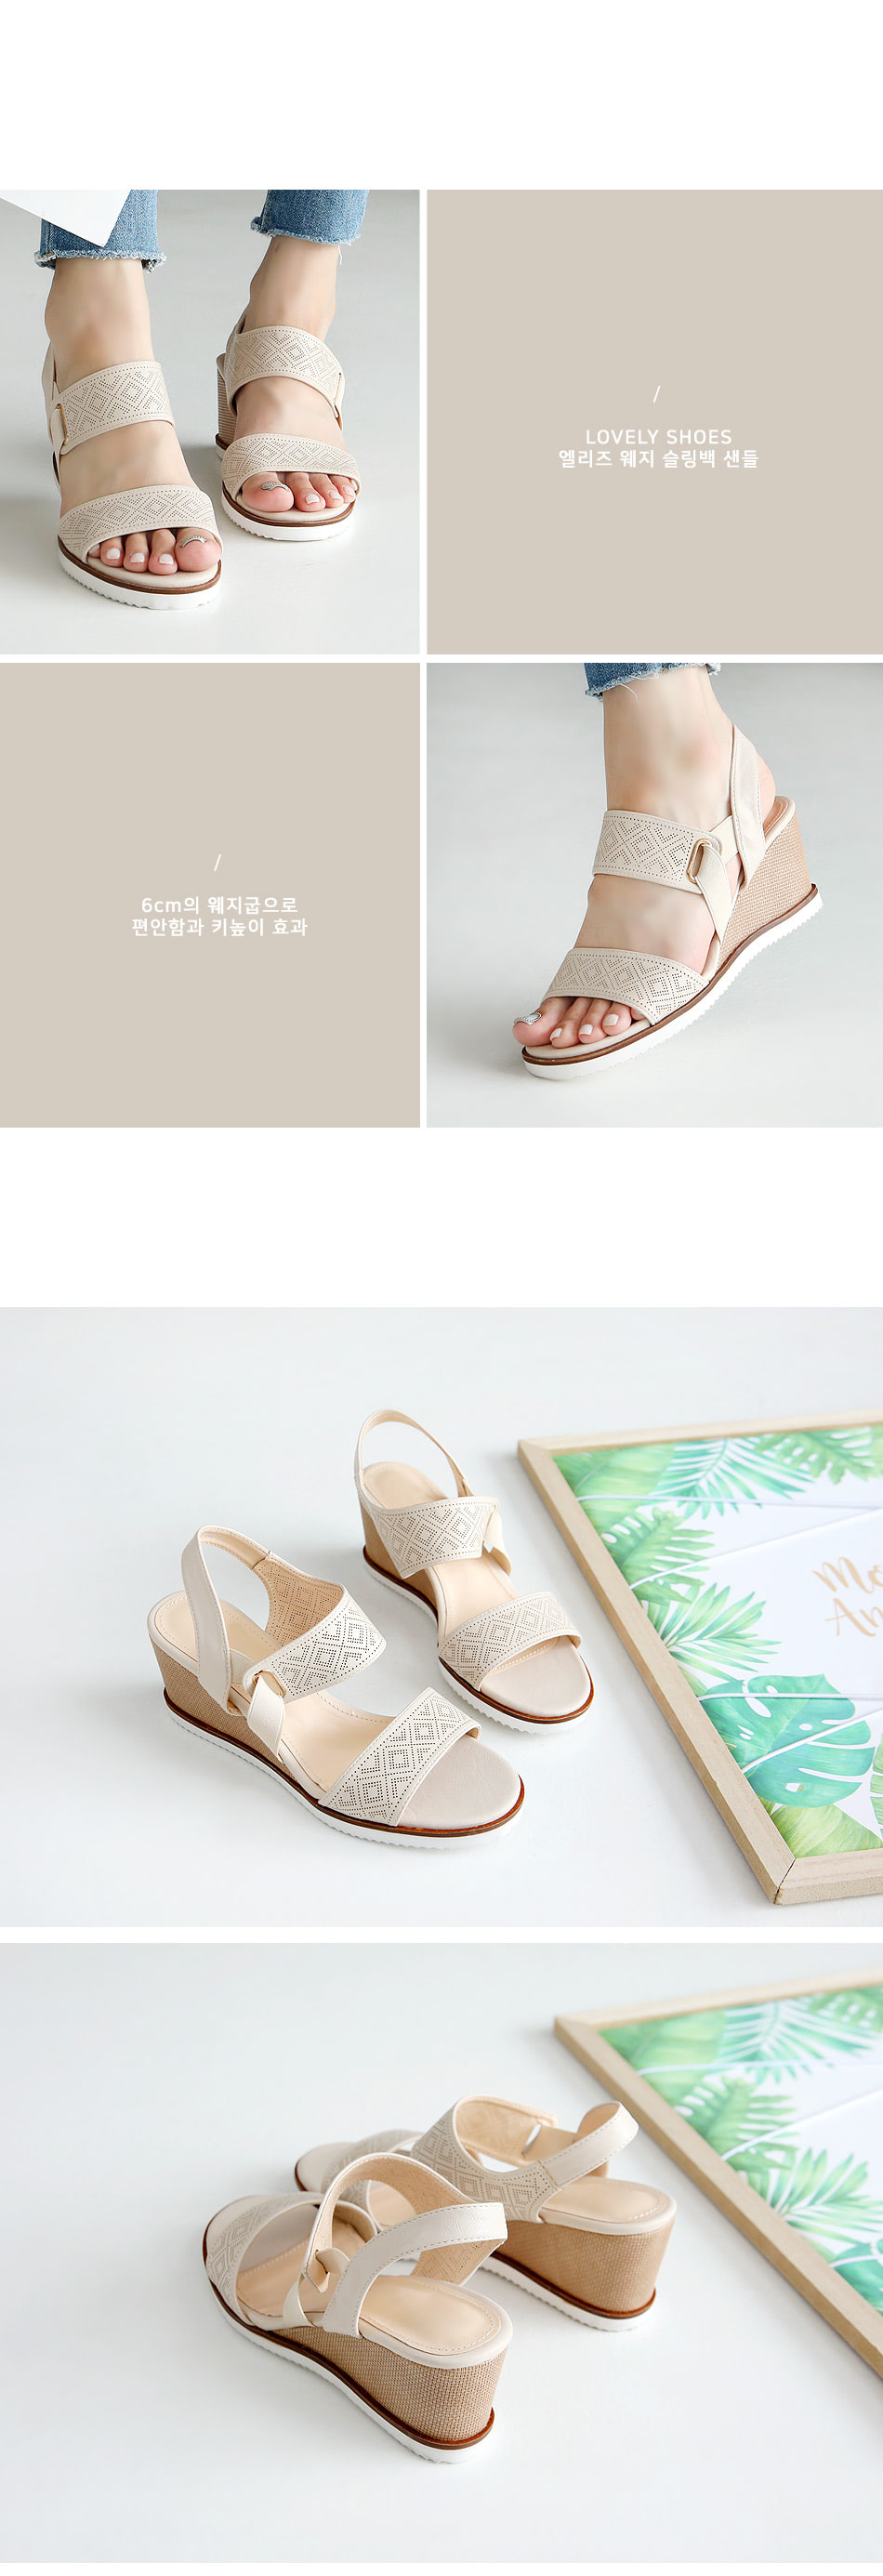 Ellie's wedge slingback sandals 6 cm